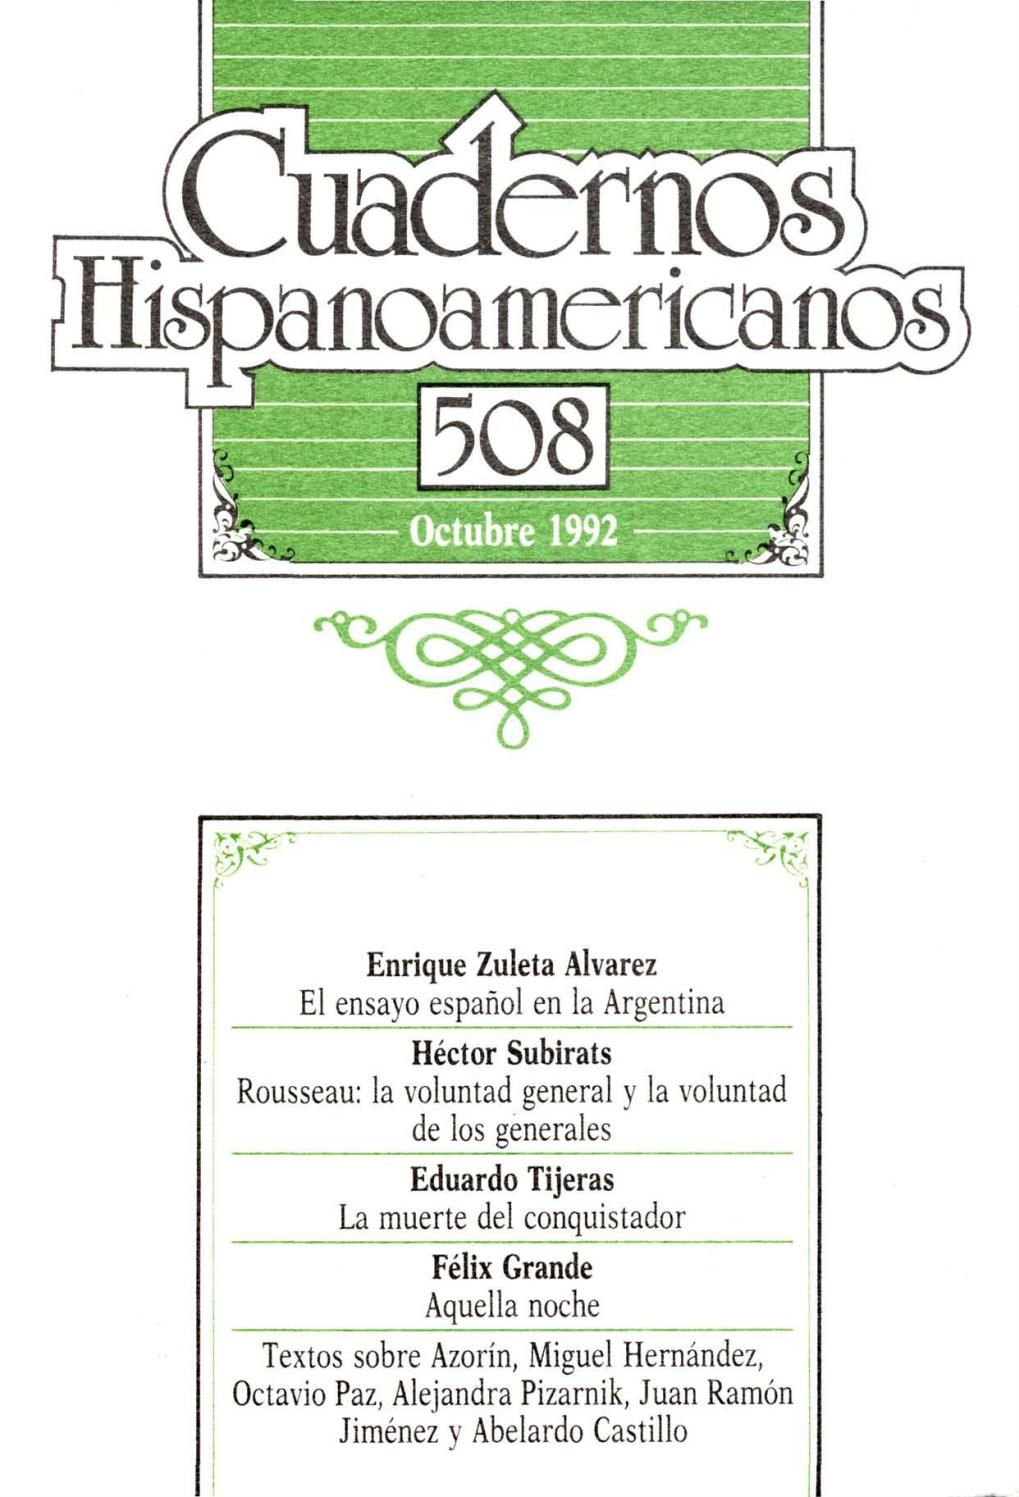 Cuadernos hispanoamericanos 508 by Tiberio - issuu